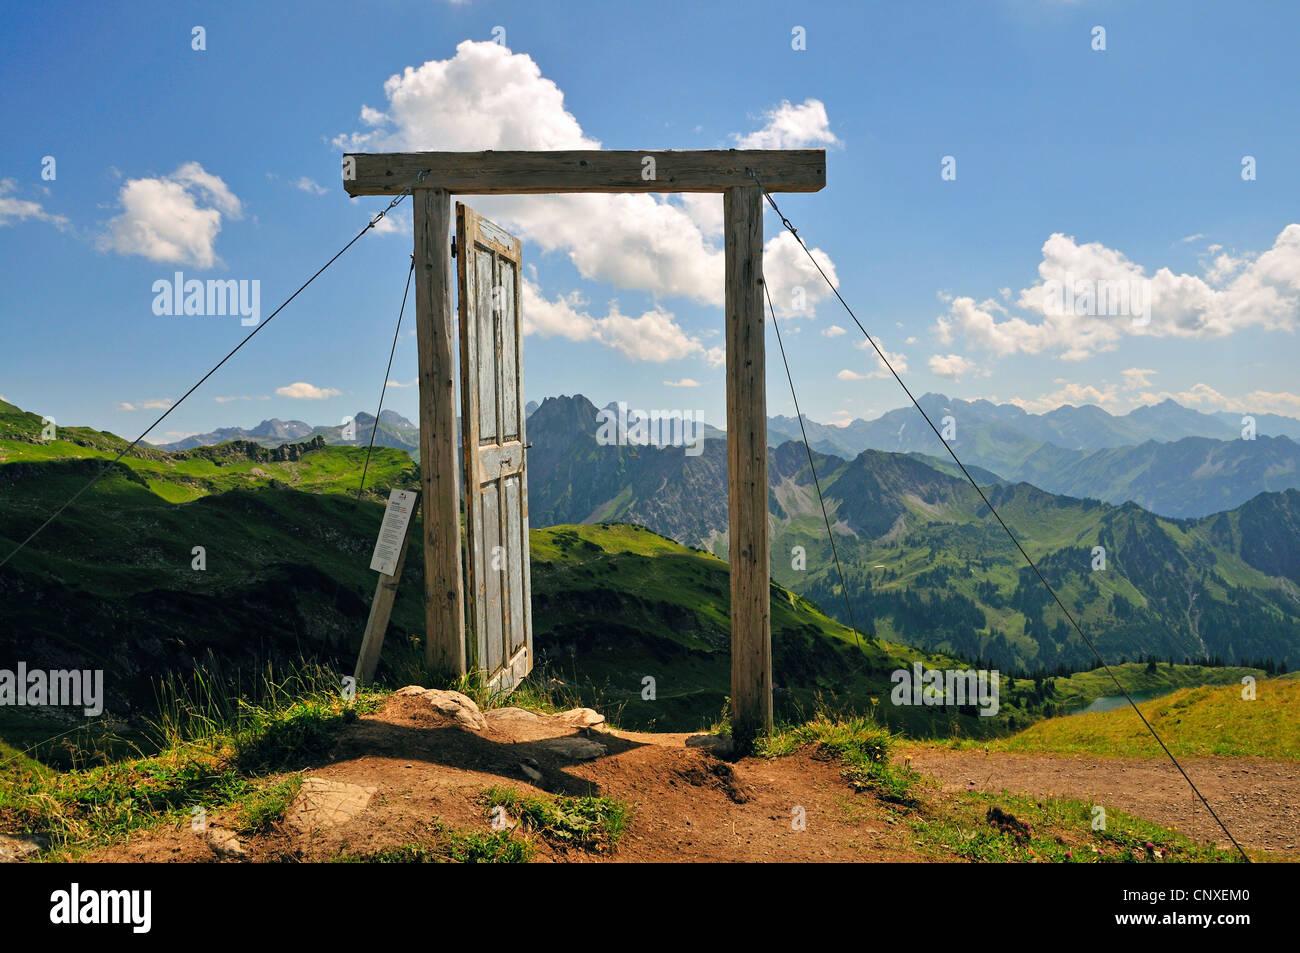 part of the projekt \u0027Open the door to another world\u0027 Porta Alpinae at Nebelhorn Germany Bavaria Allgaeu Allgaeu Alps & part of the projekt \u0027Open the door to another world\u0027 Porta ...